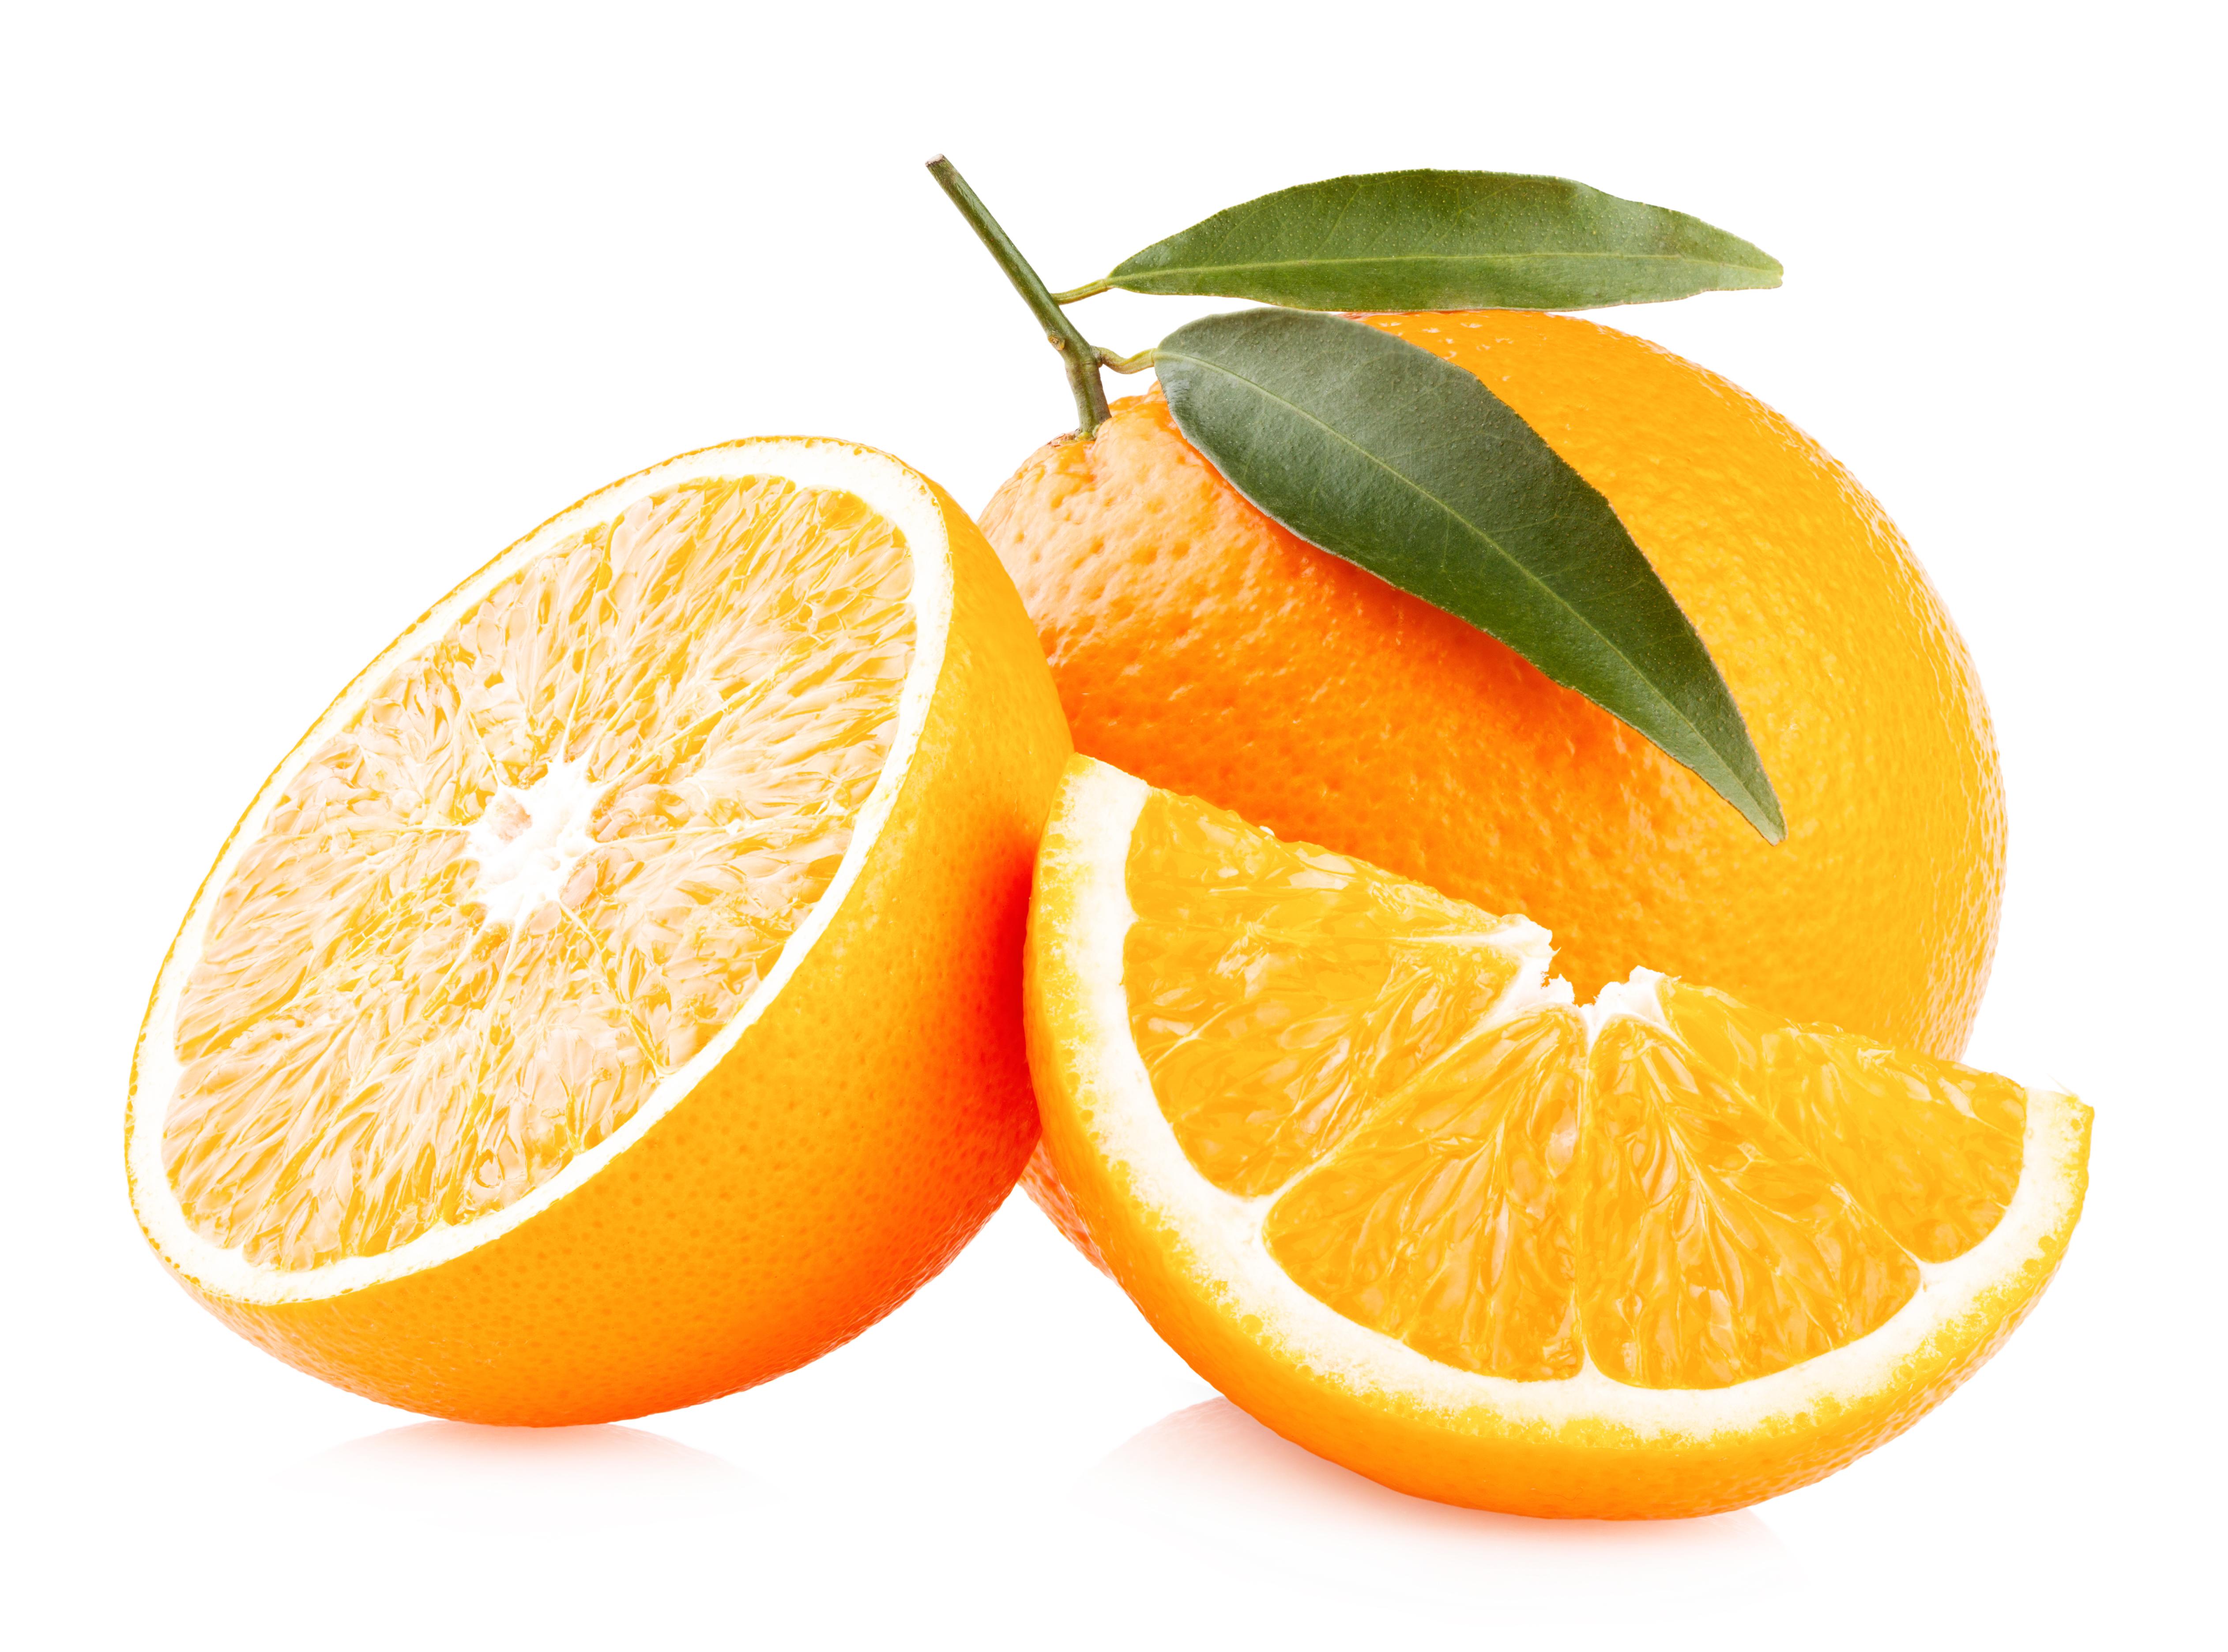 Sliced ripe oranges photo